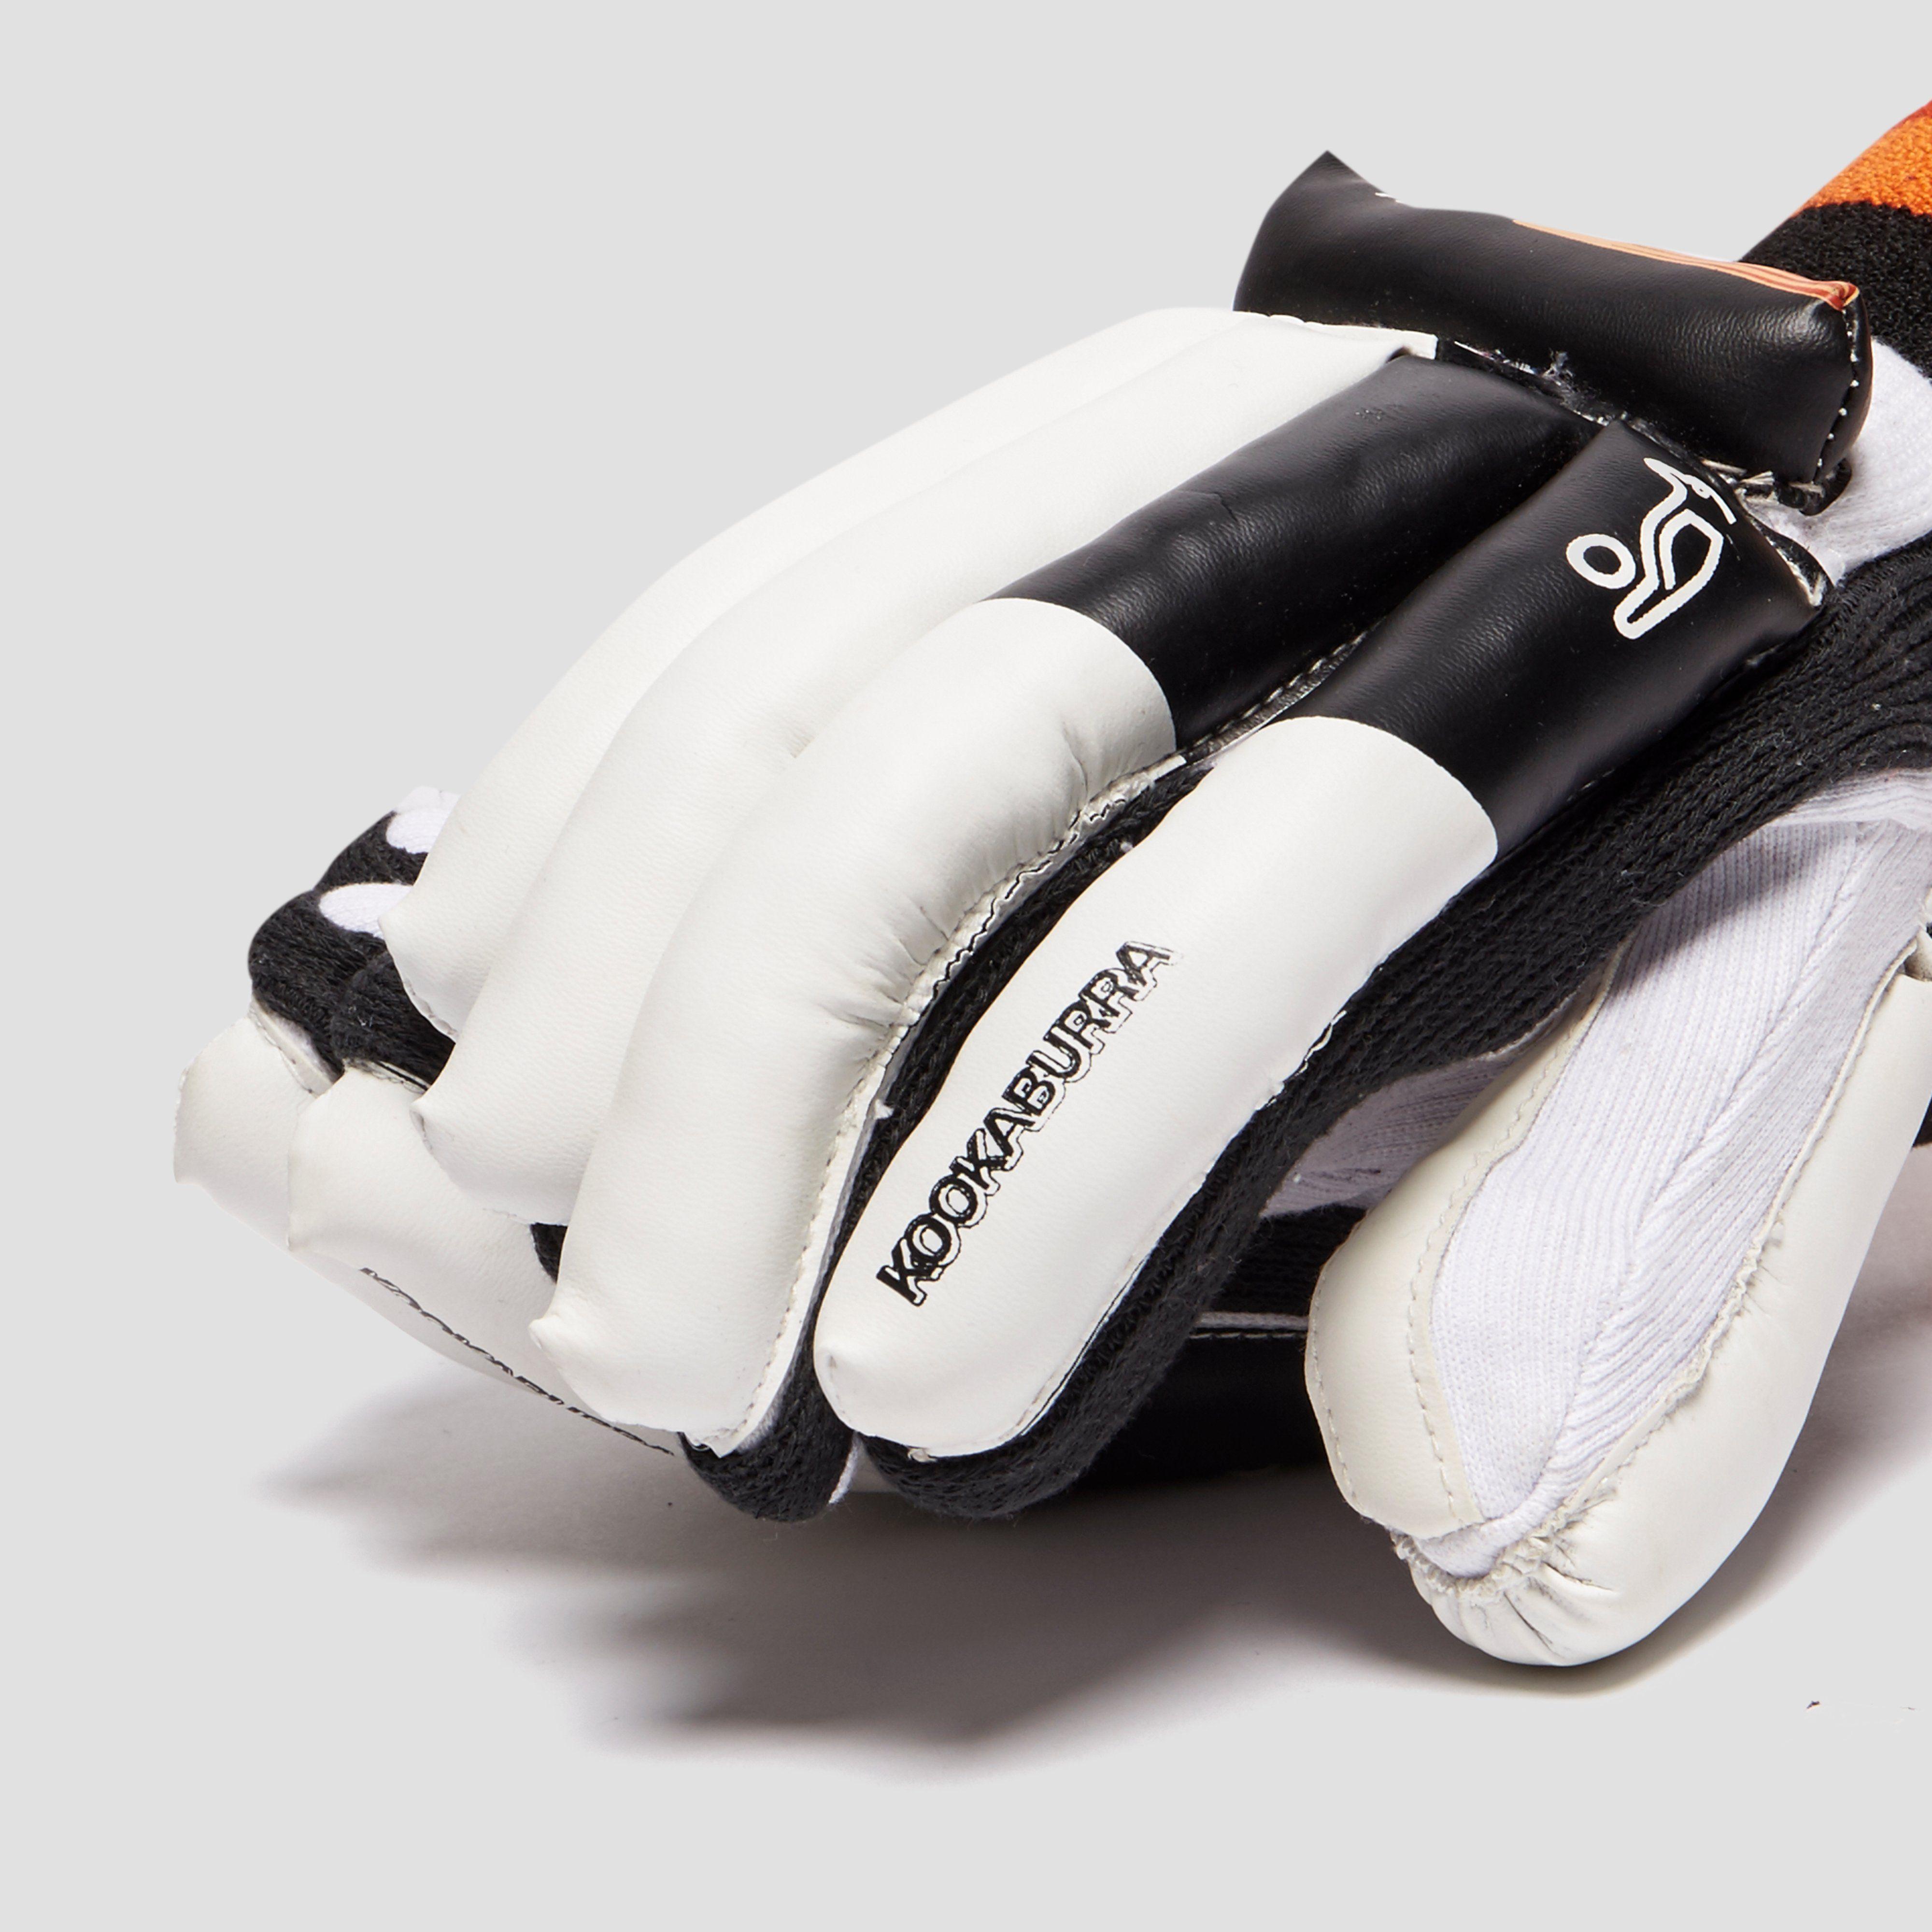 Kookaburra Blaze 100 Junior Cricket Batting Gloves